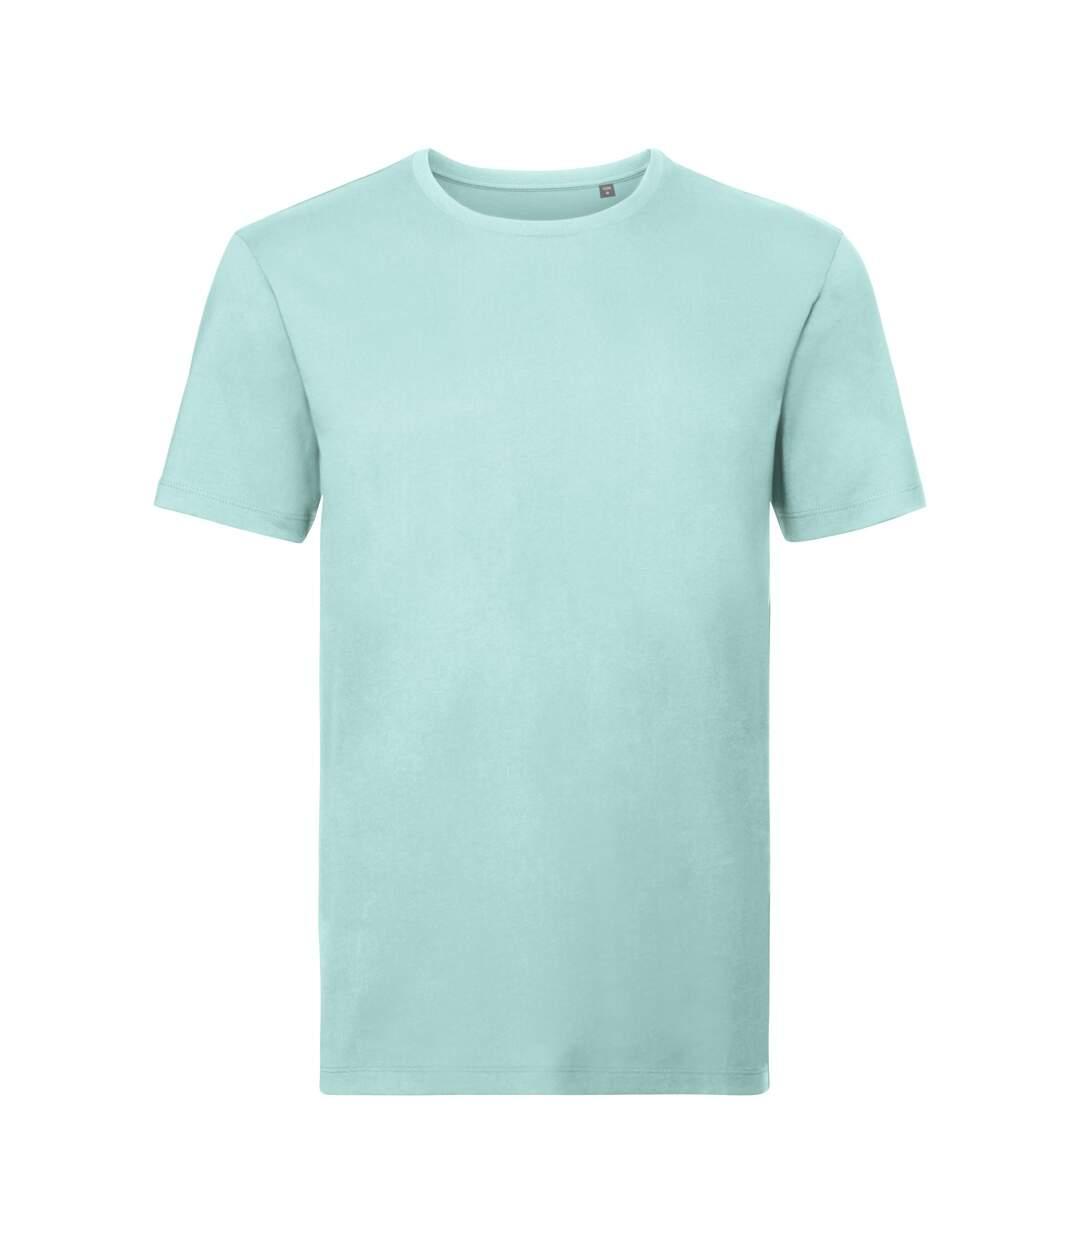 Russell Mens Authentic Pure Organic T-Shirt (Aqua) - UTPC3569